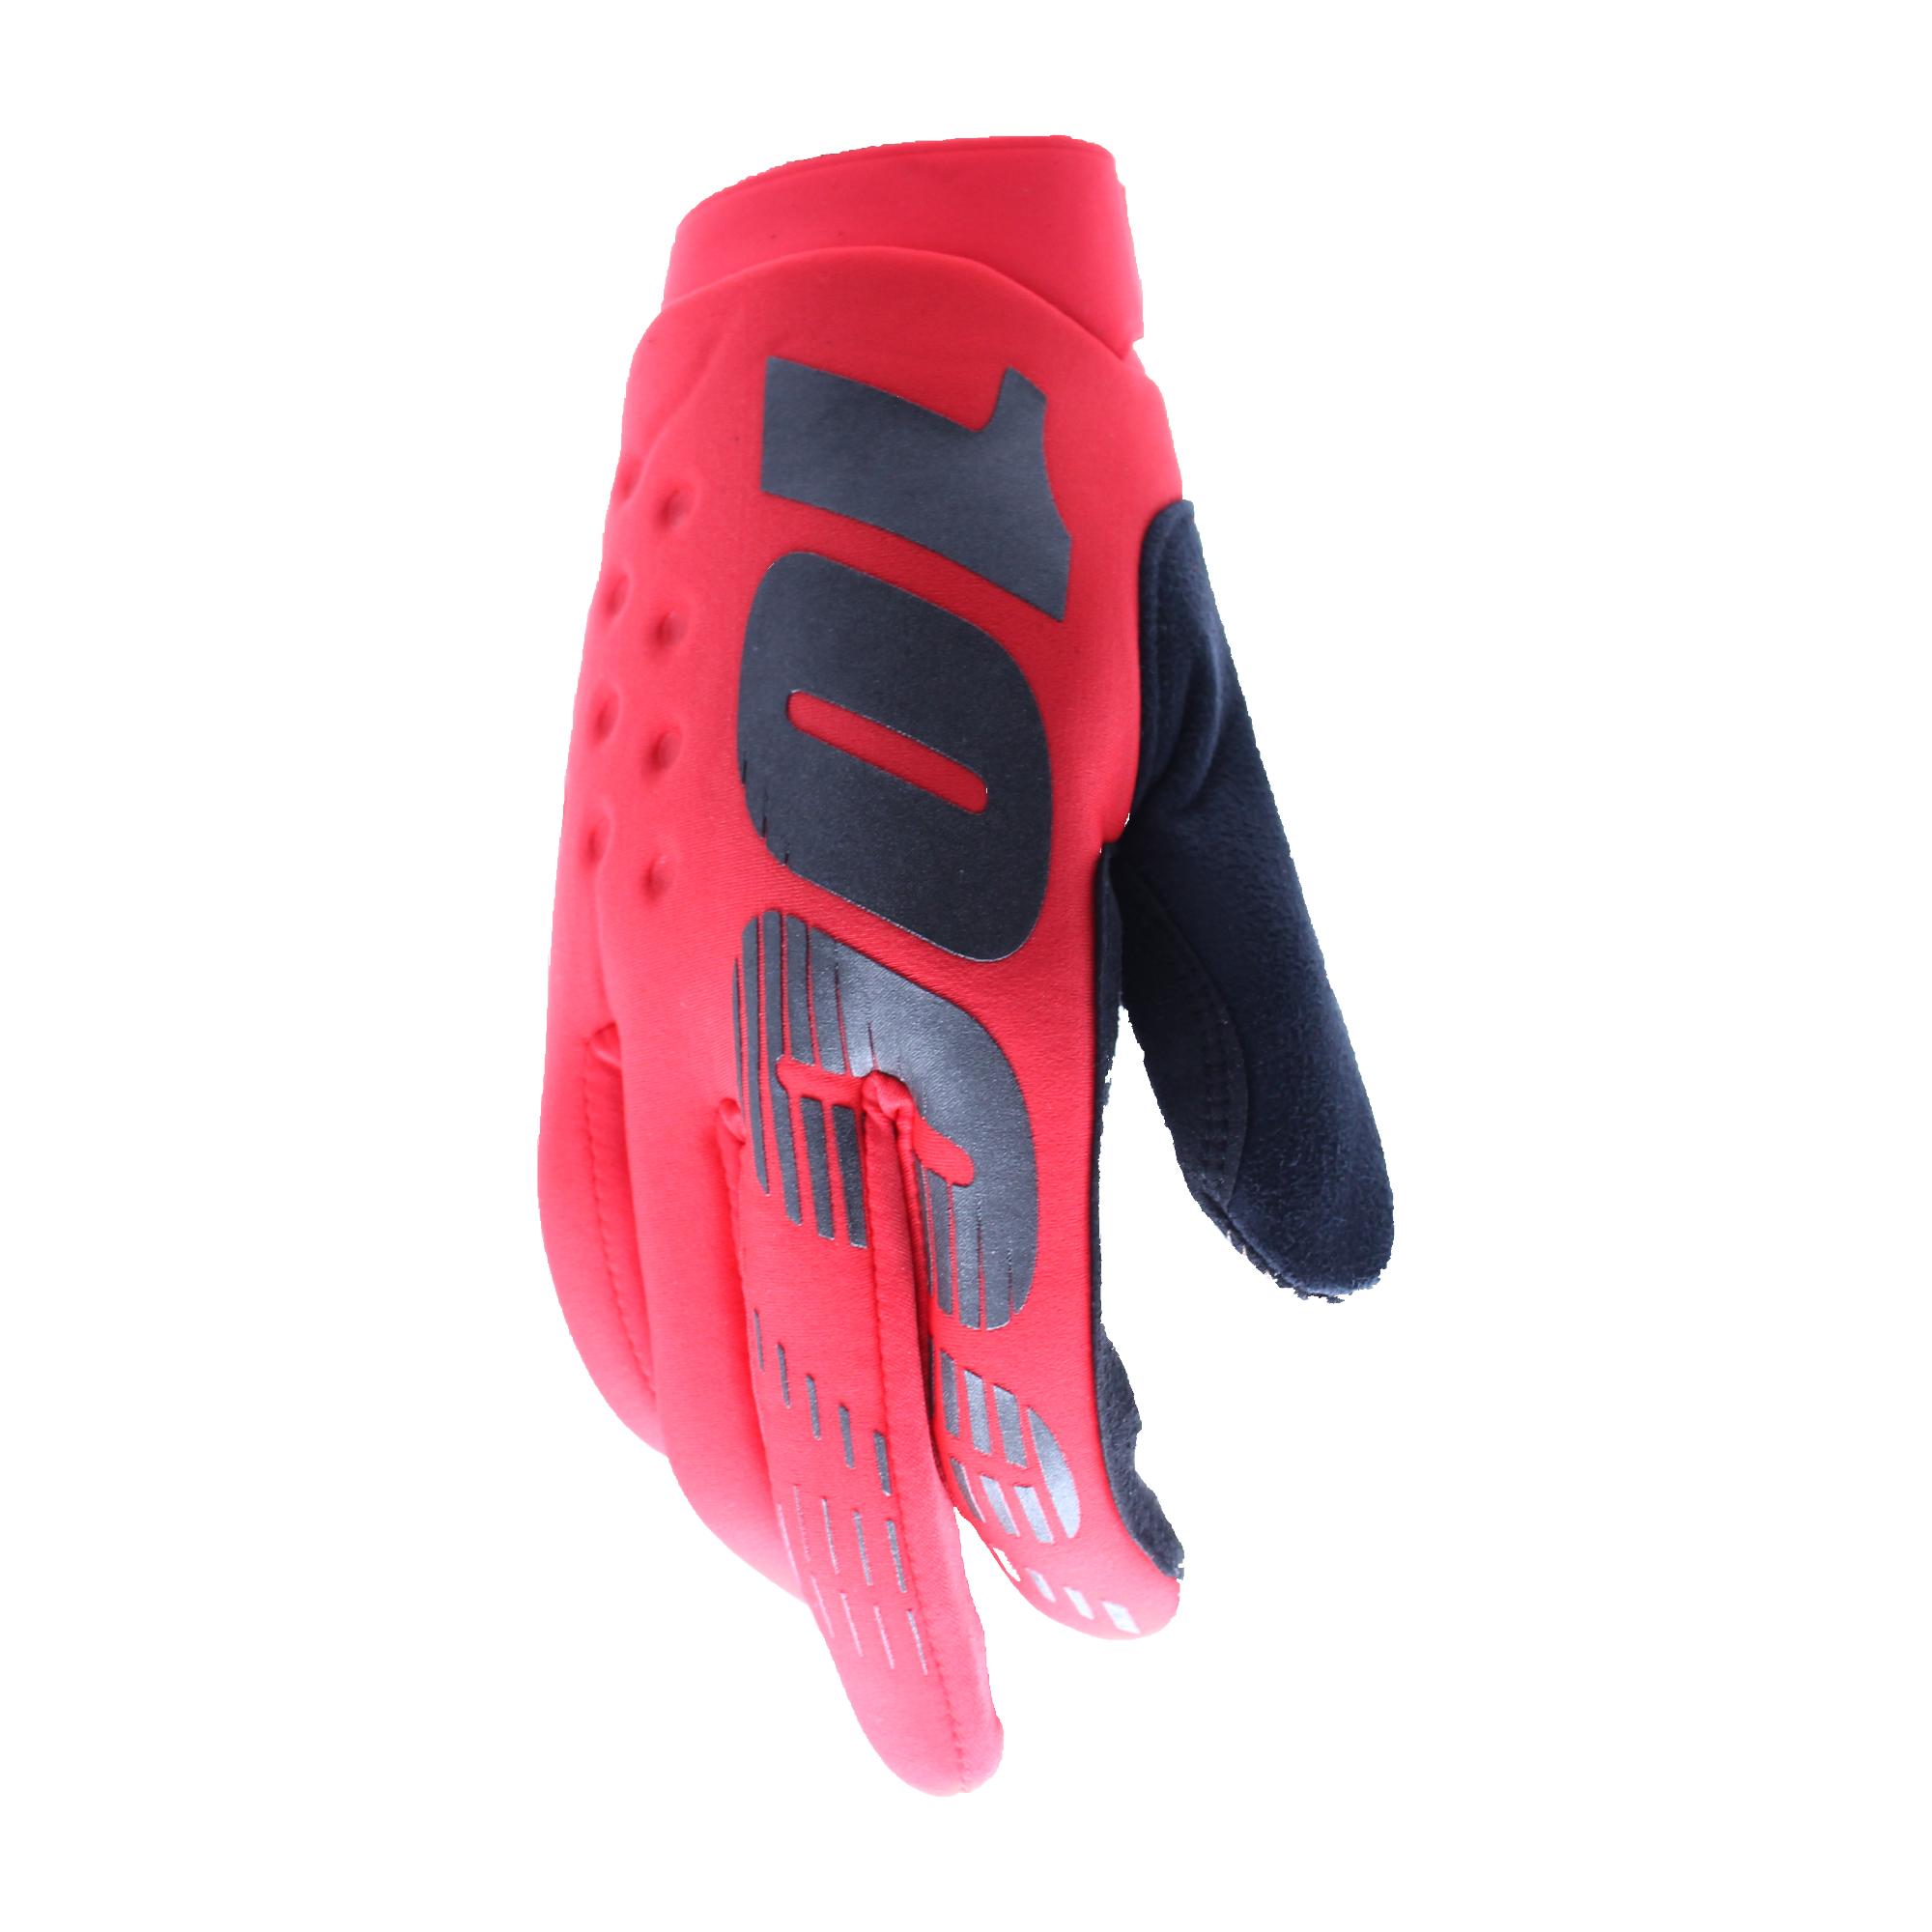 100 Percent Brisker Gloves Fluorescent Yellow